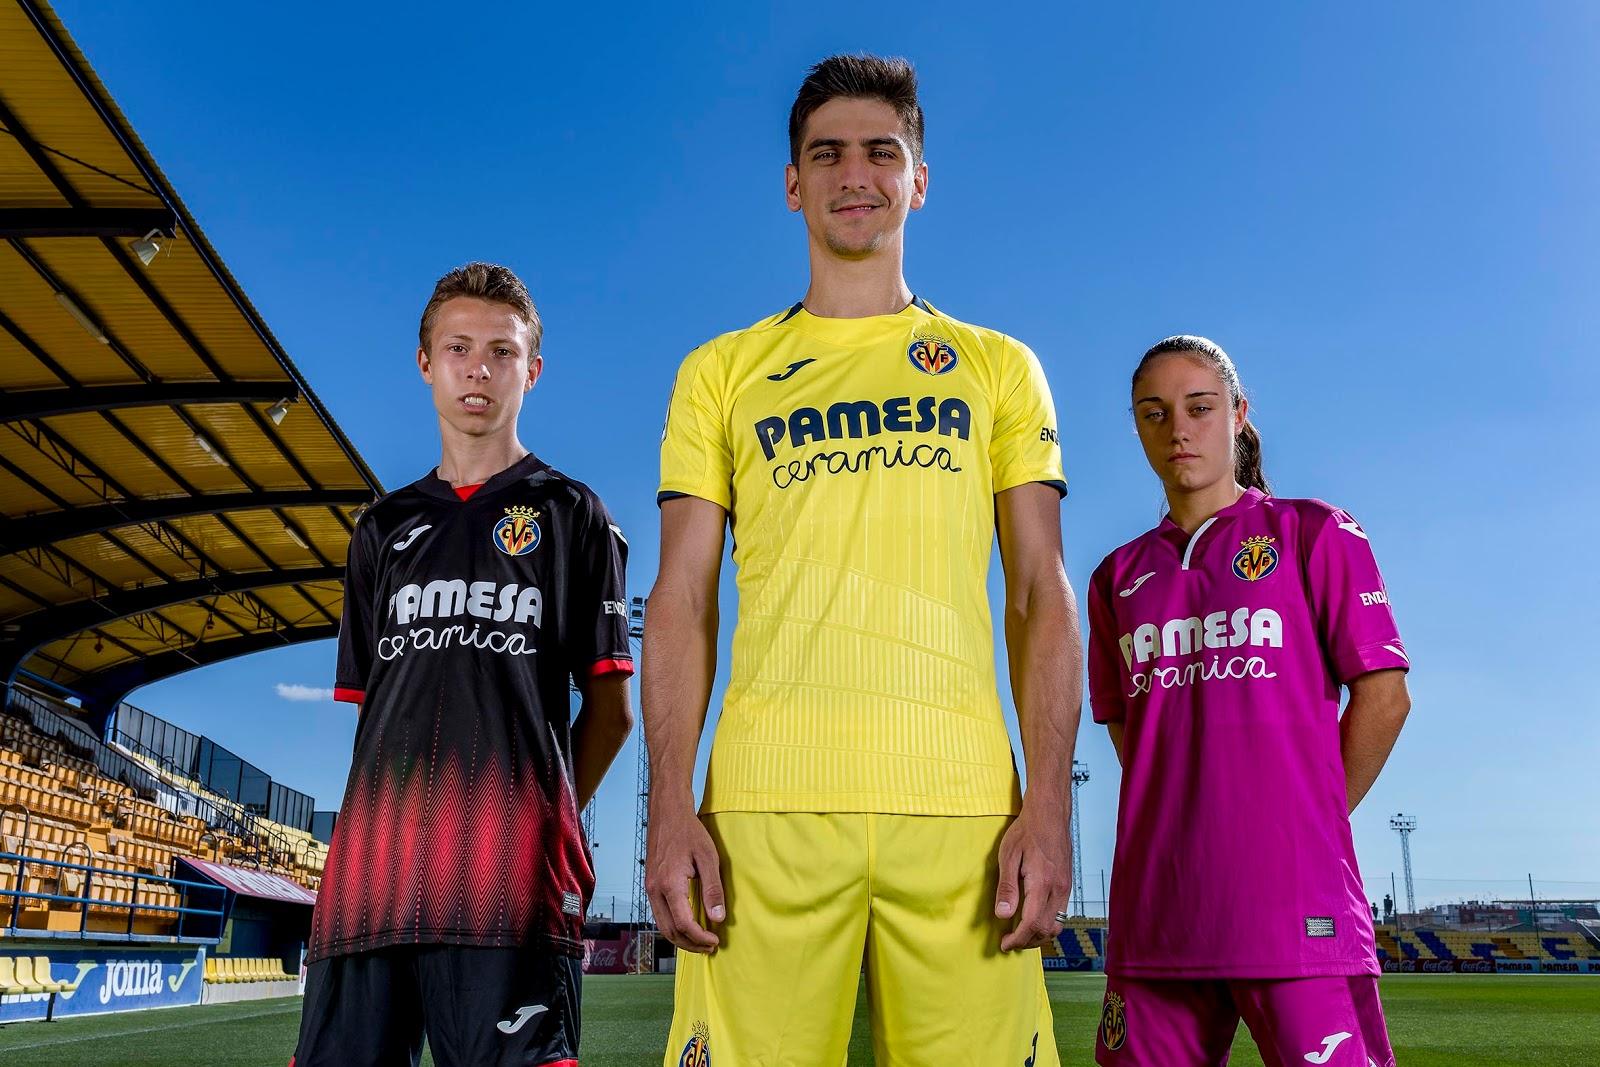 Villareal 2019 nouveaux maillots de football